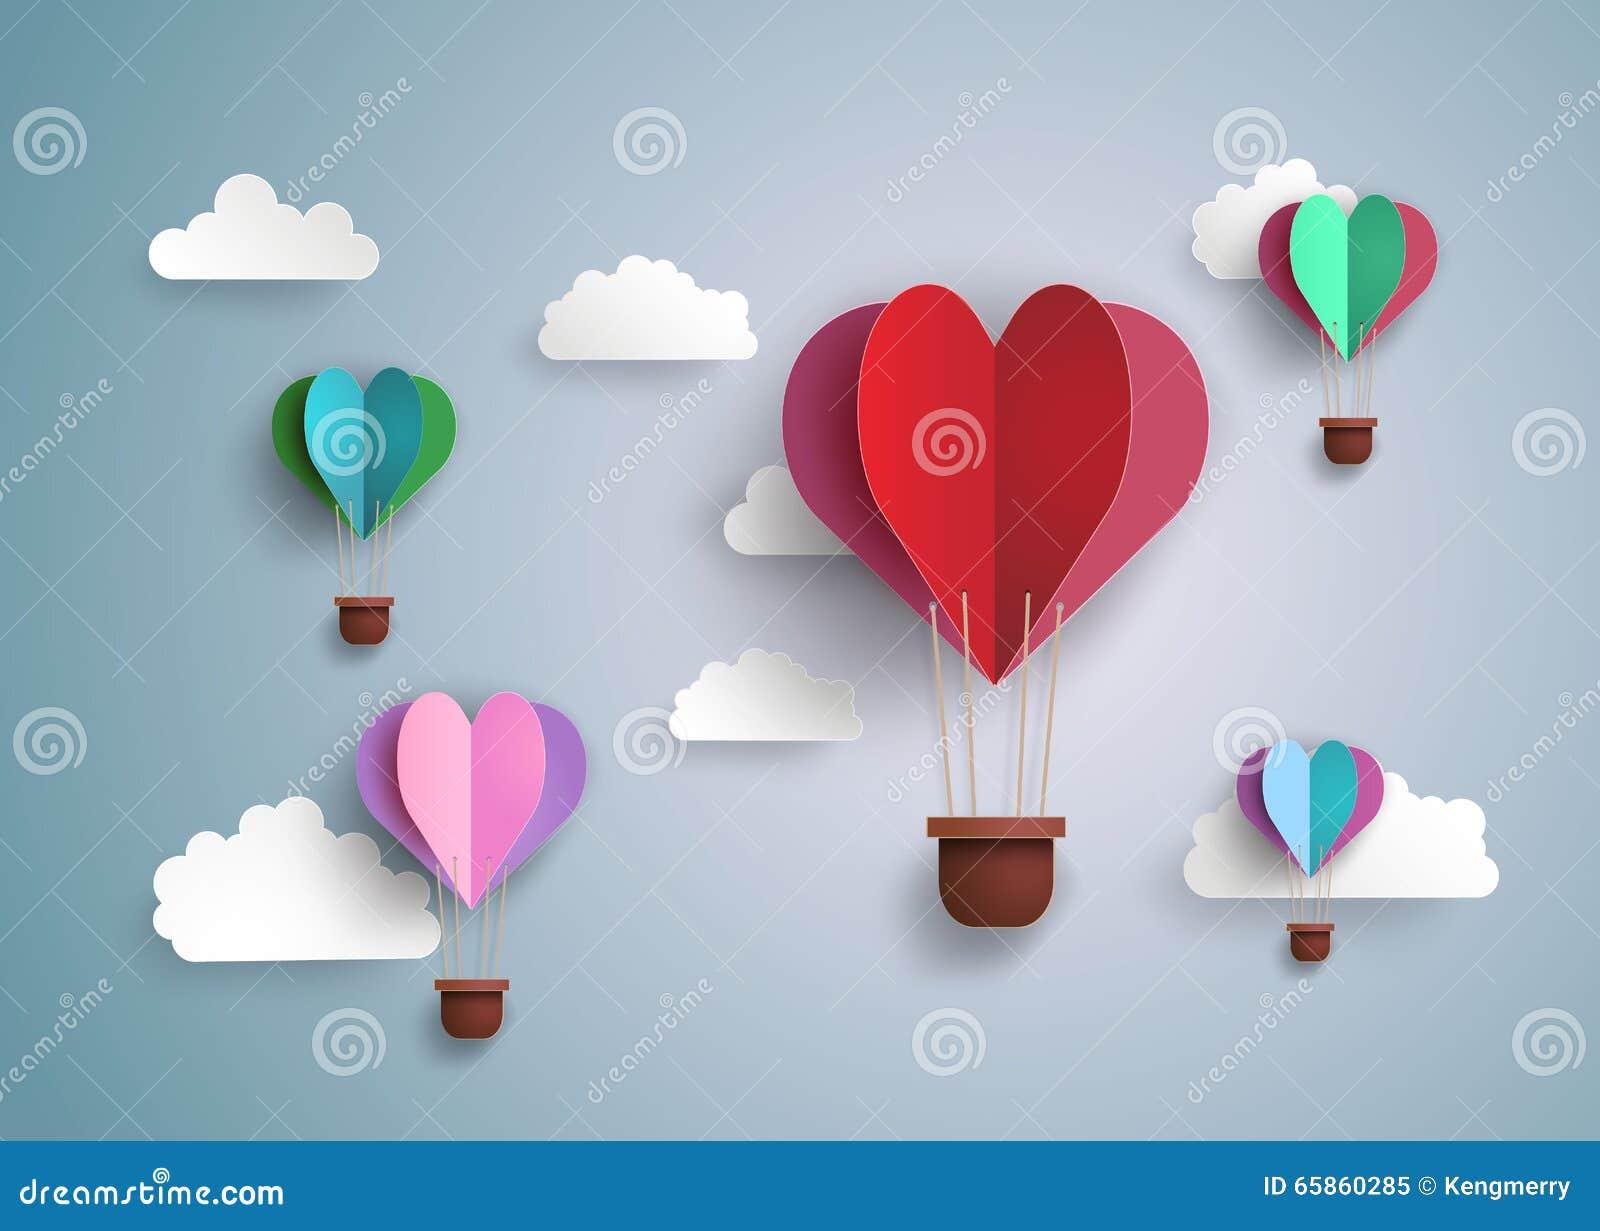 Hot air balloon in a heart shape stock vector illustration of hot air balloon in a heart shape summer decorative jeuxipadfo Choice Image